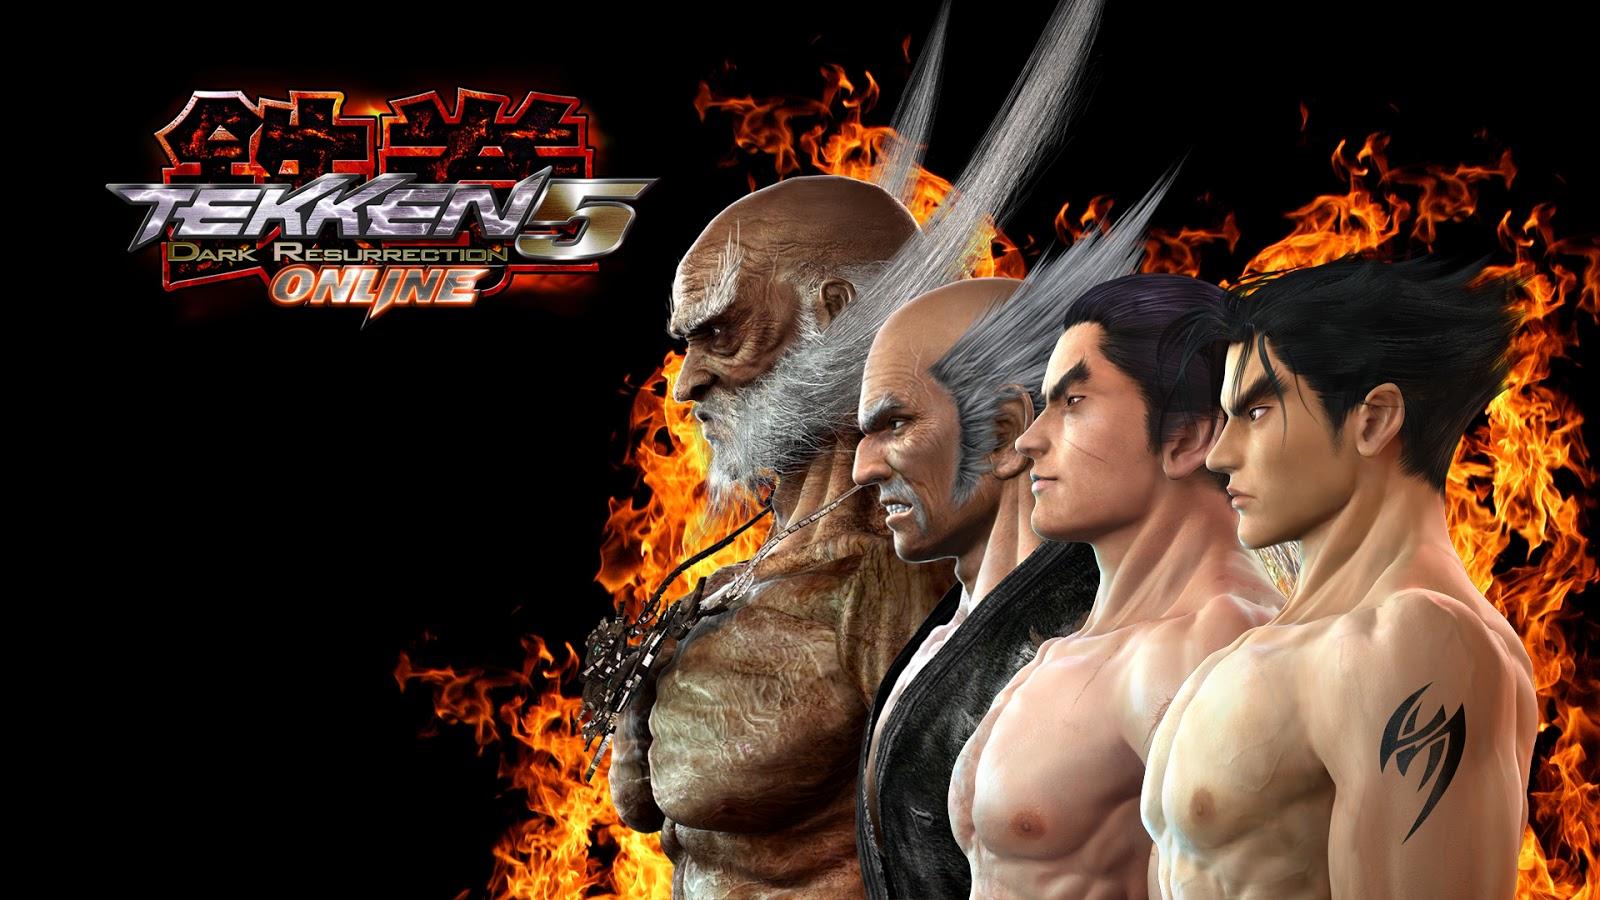 GAMEZONE: Tekken 5 Jin